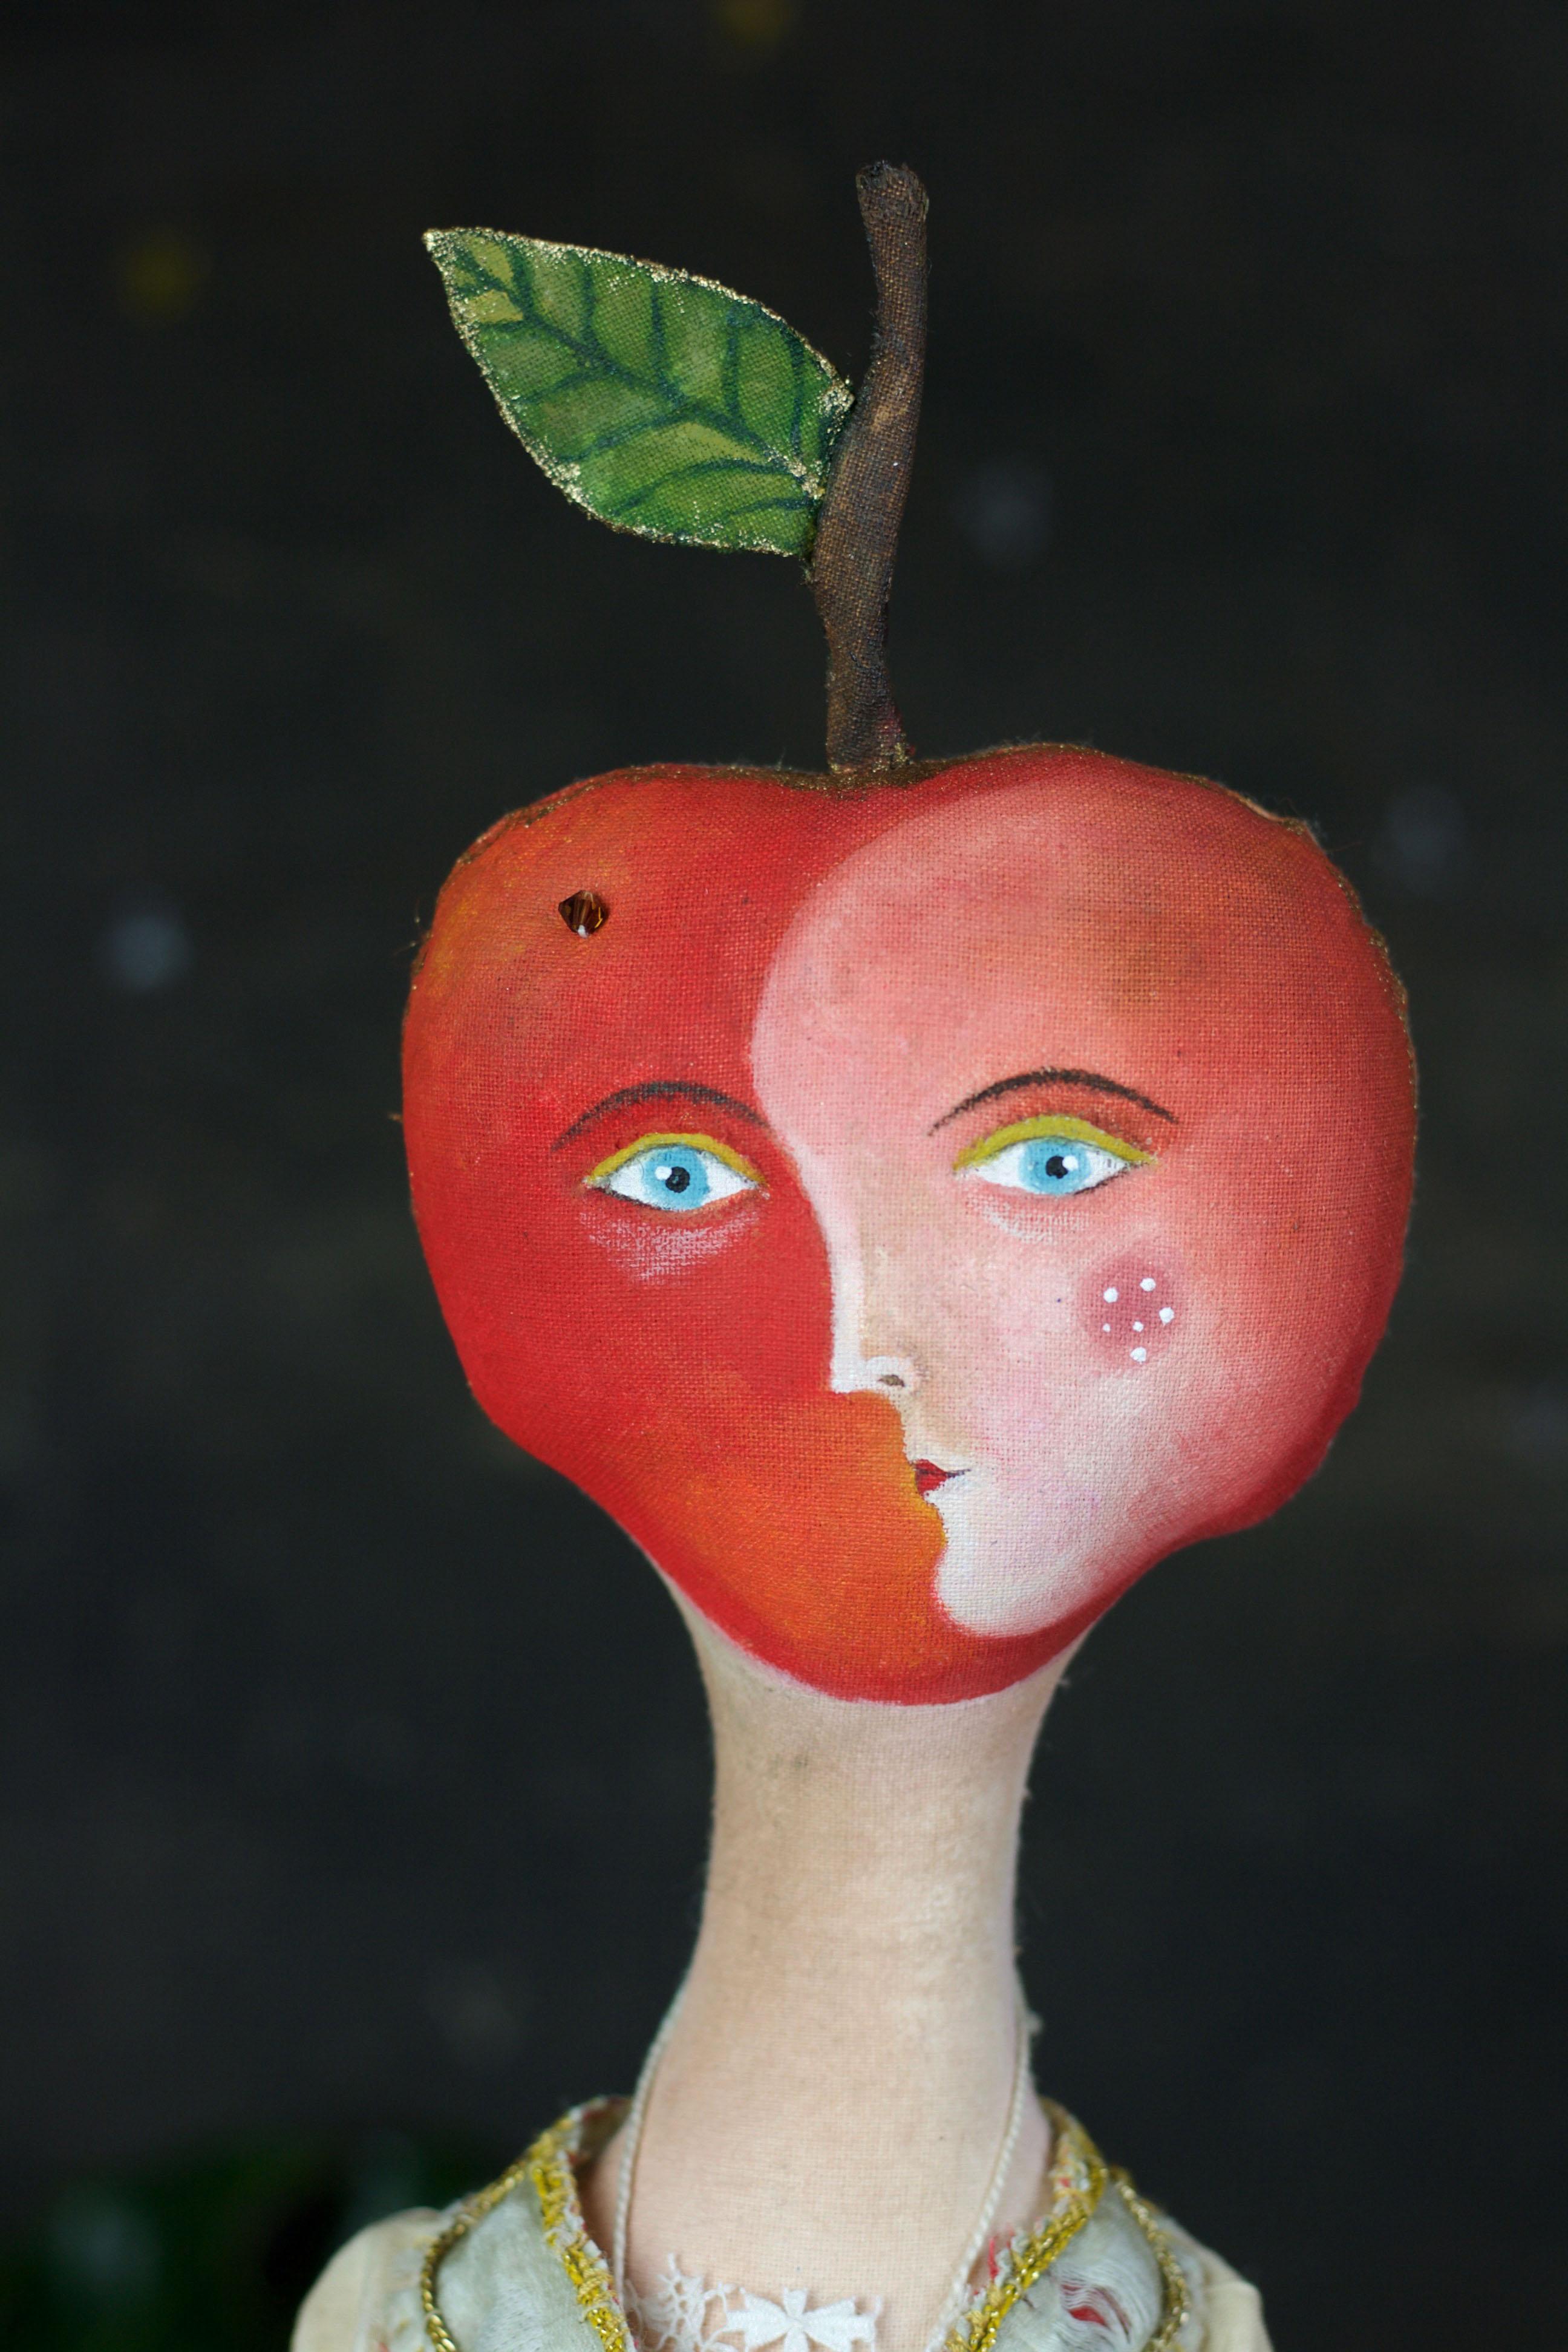 fruit face doll